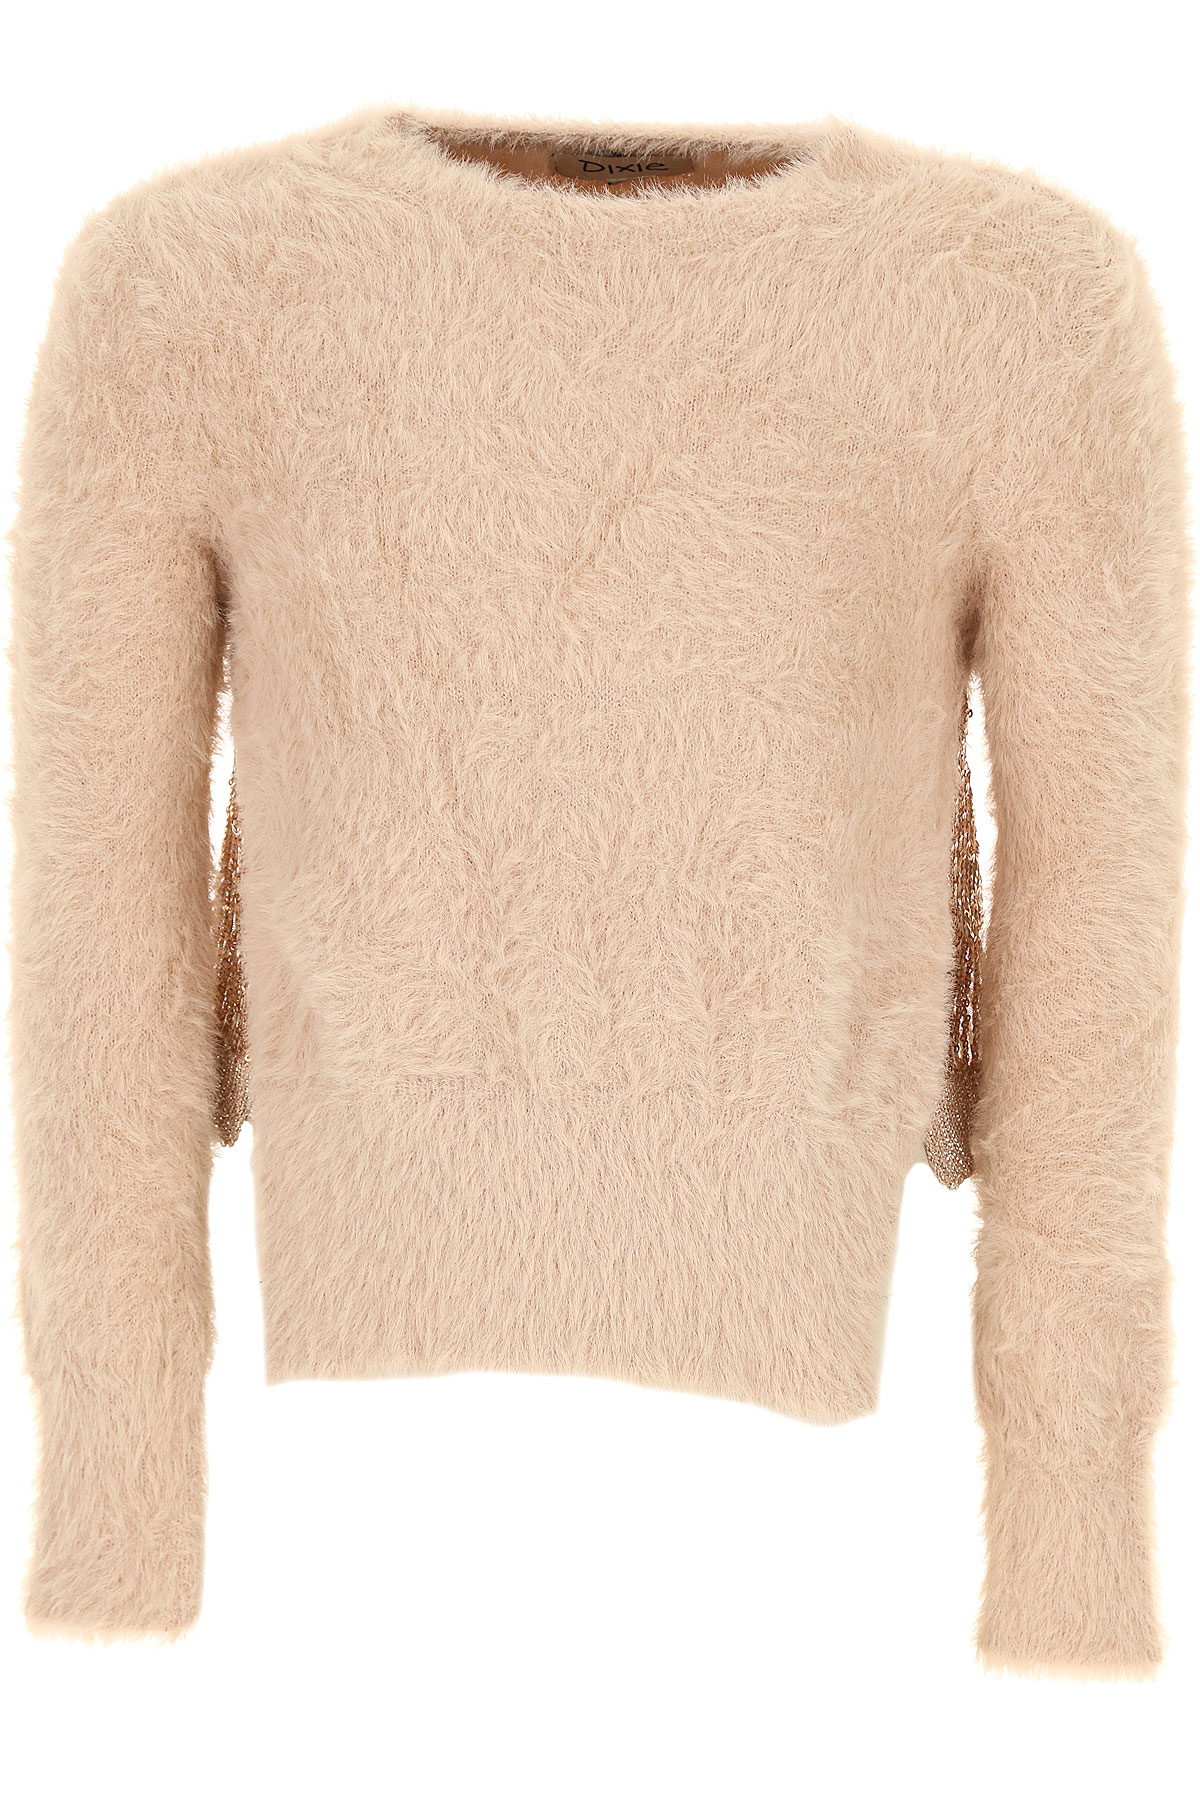 Dixie Kids Sweaters for Girls On Sale, Pink, polyamide, 2019, L XL XXL